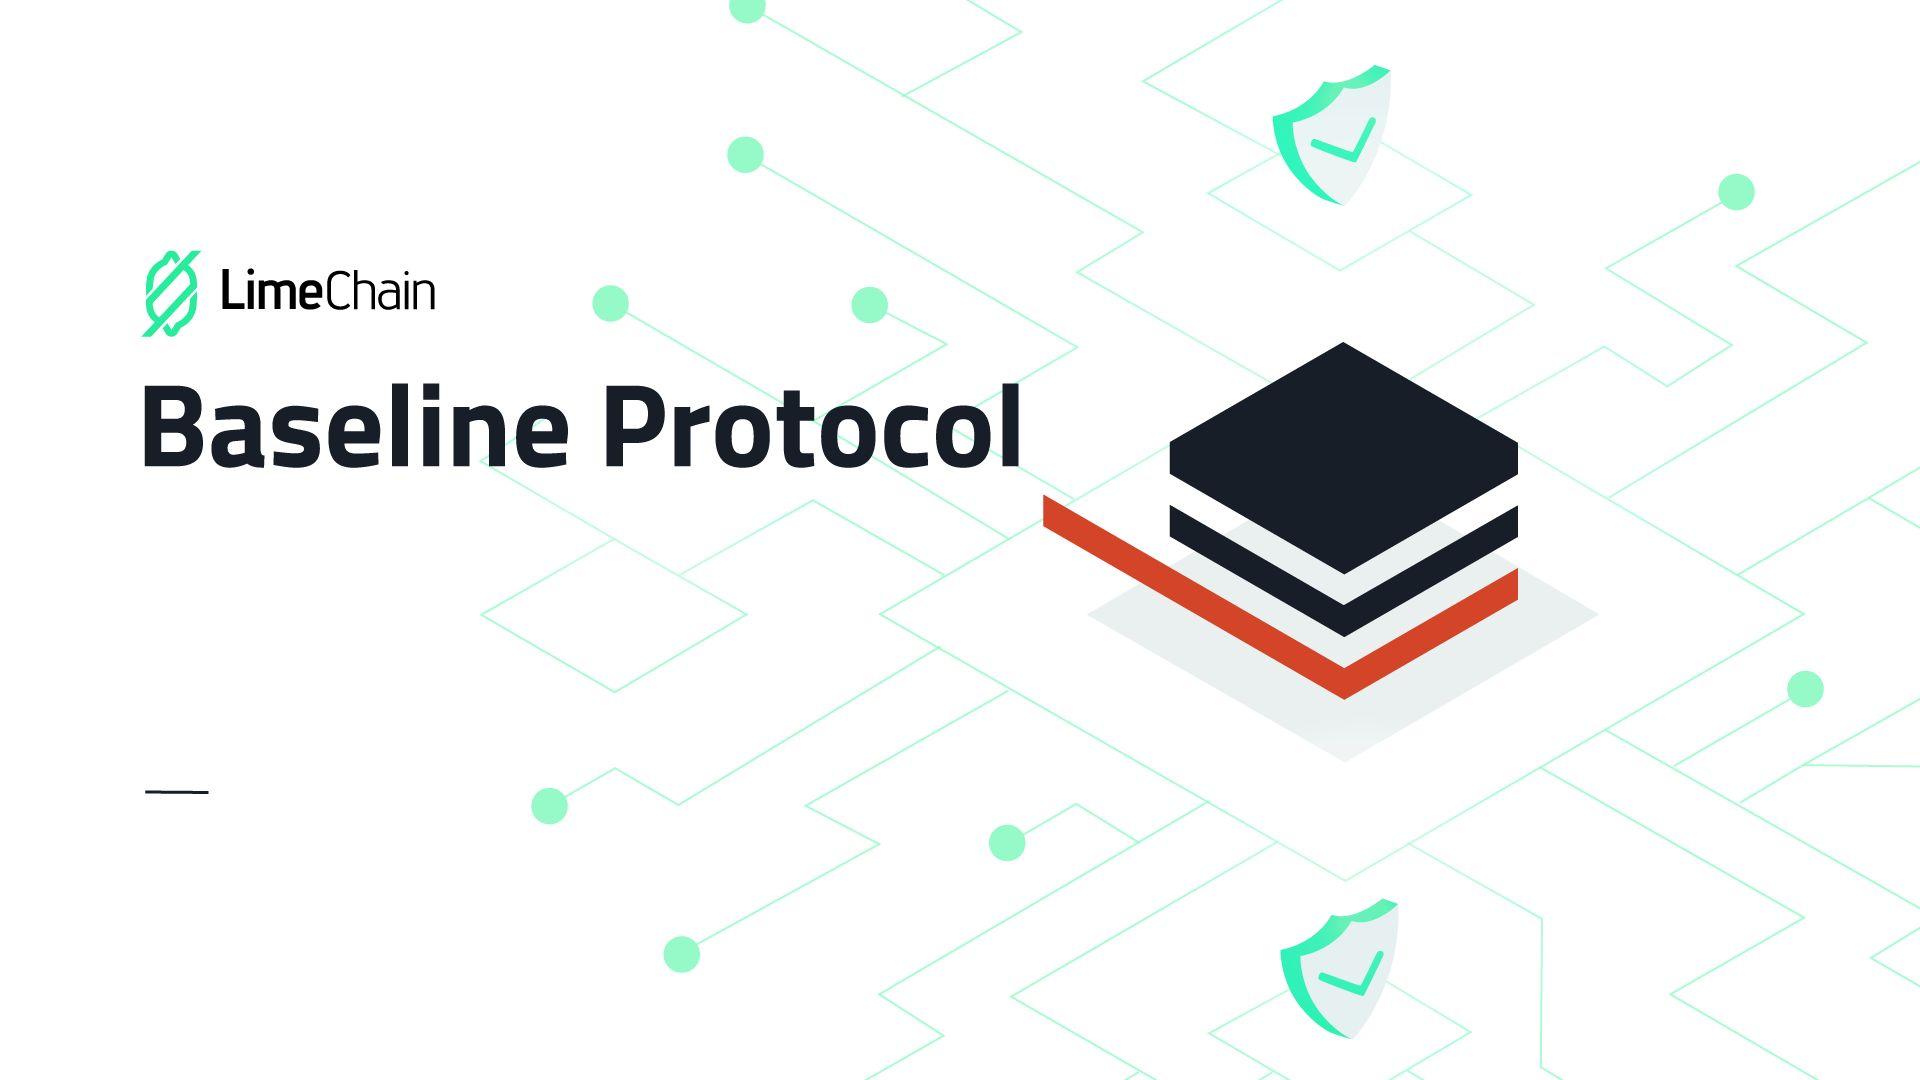 /the-baseline-protocol-explained-q5m3yaq feature image